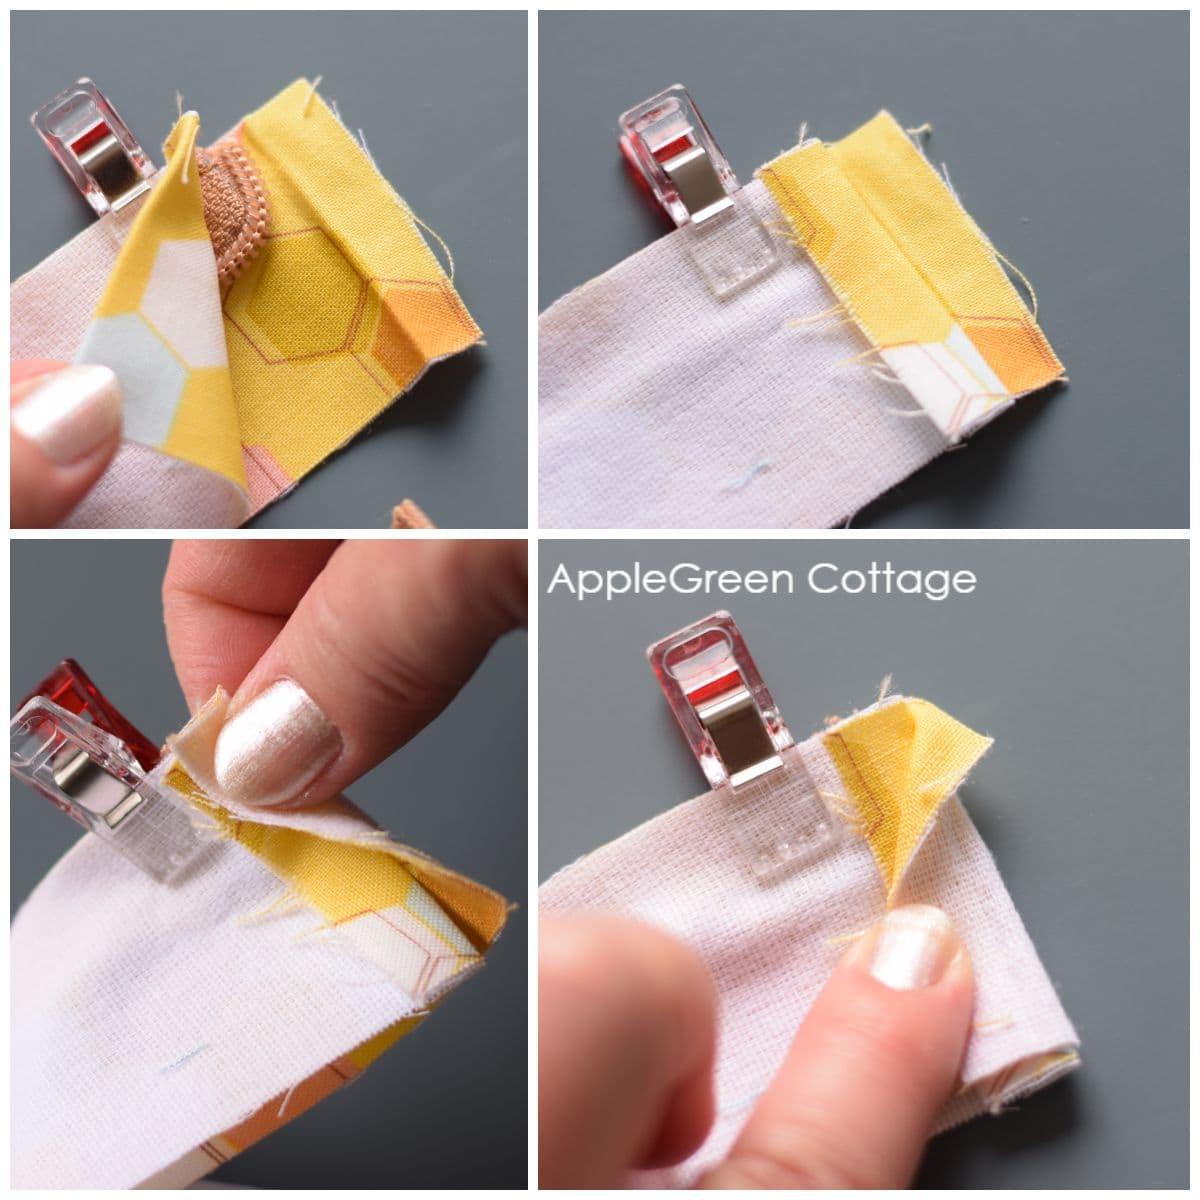 folding detail for making an inset zipper closure